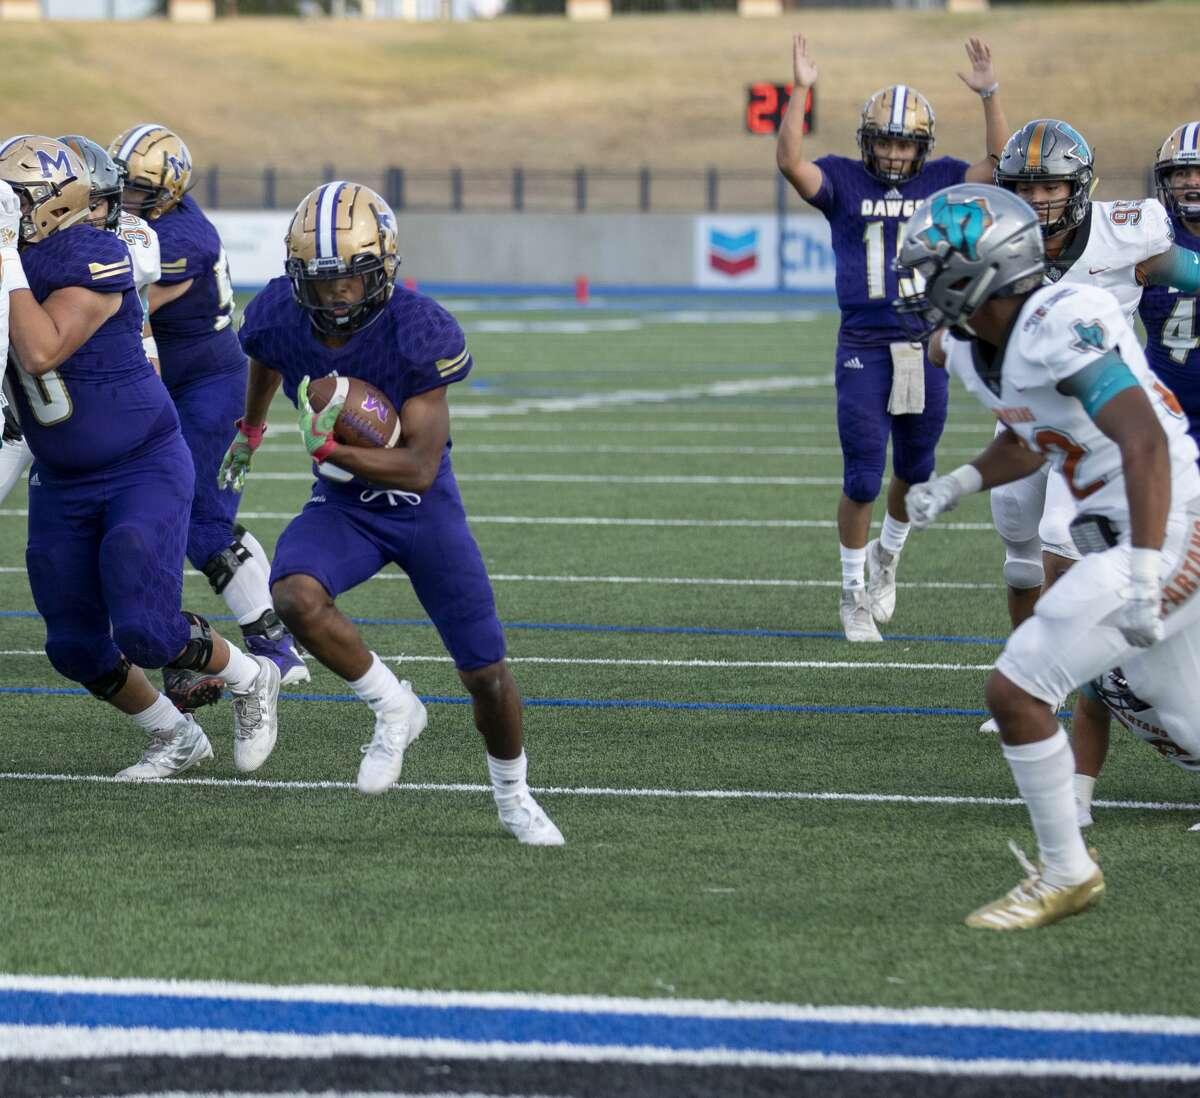 Midland High's Daniel Garcia scores a touchdown Friday, Sept. 6, 2019 at Grande Communications Stadium.